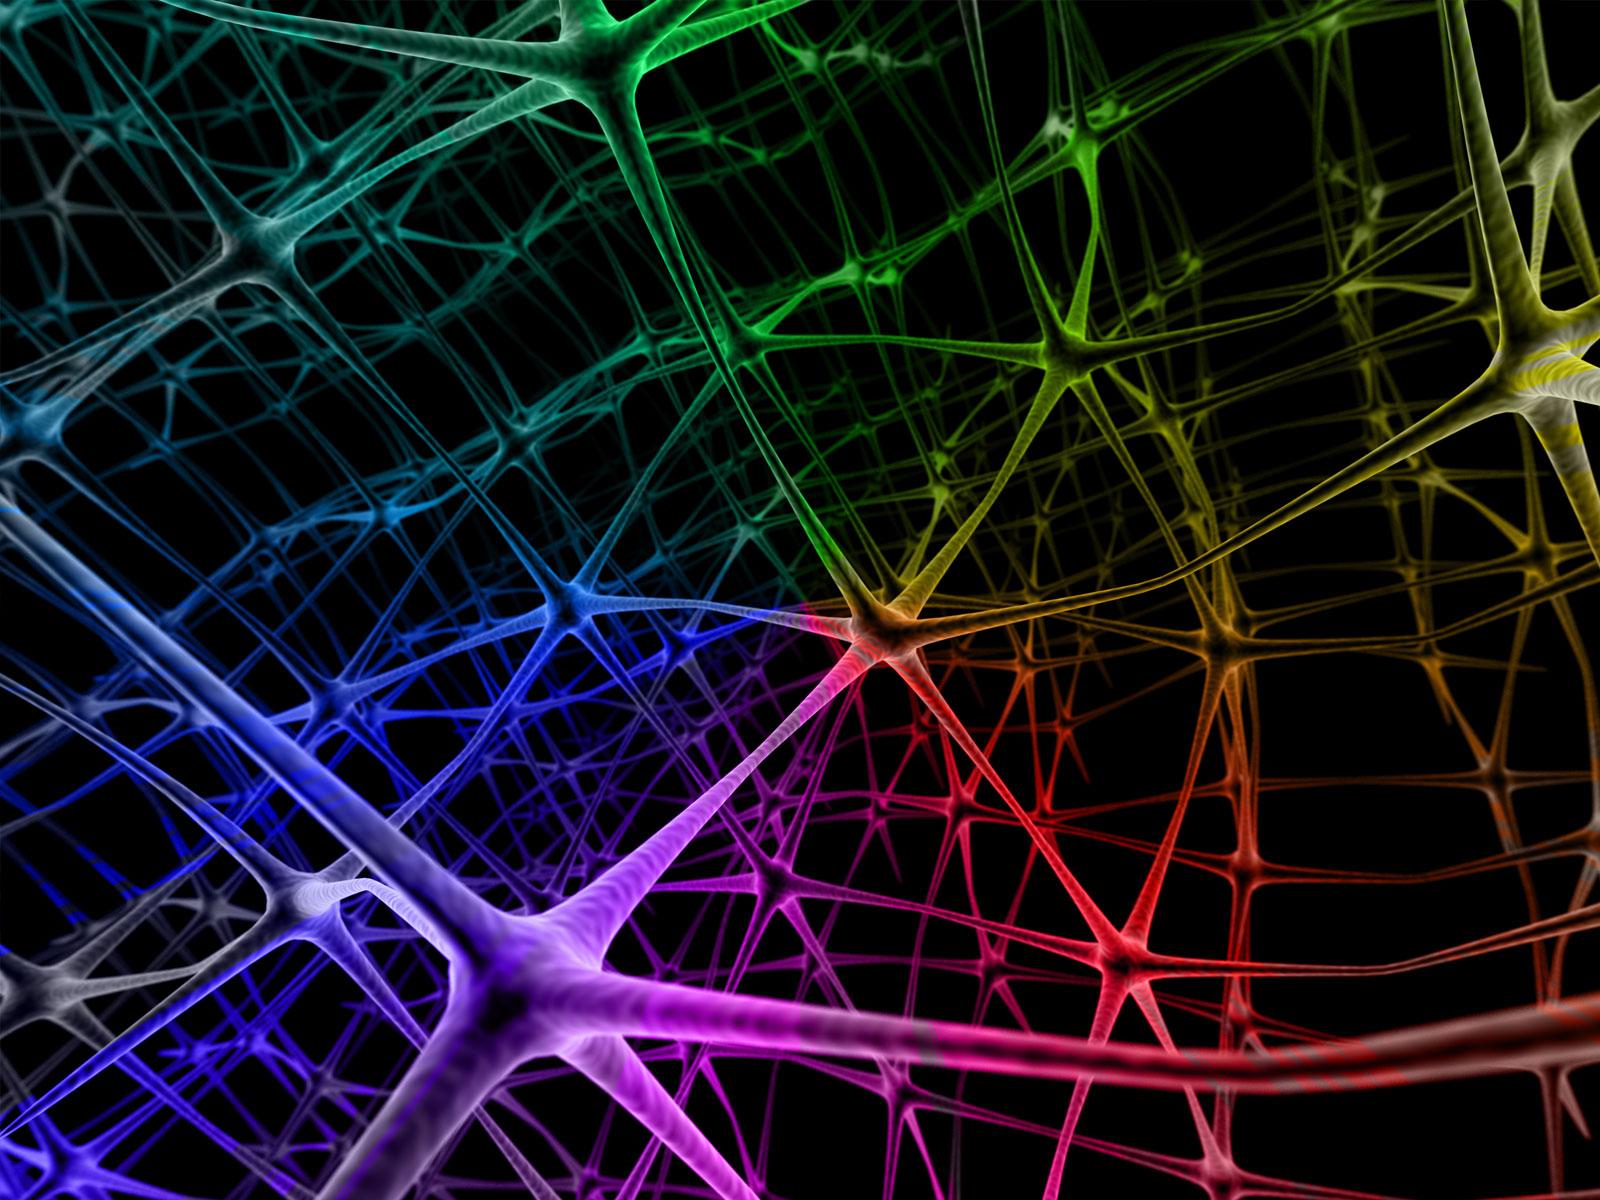 Shambala Networks - Ant Sin (True Friendship) [Deep Experimental Ambient]